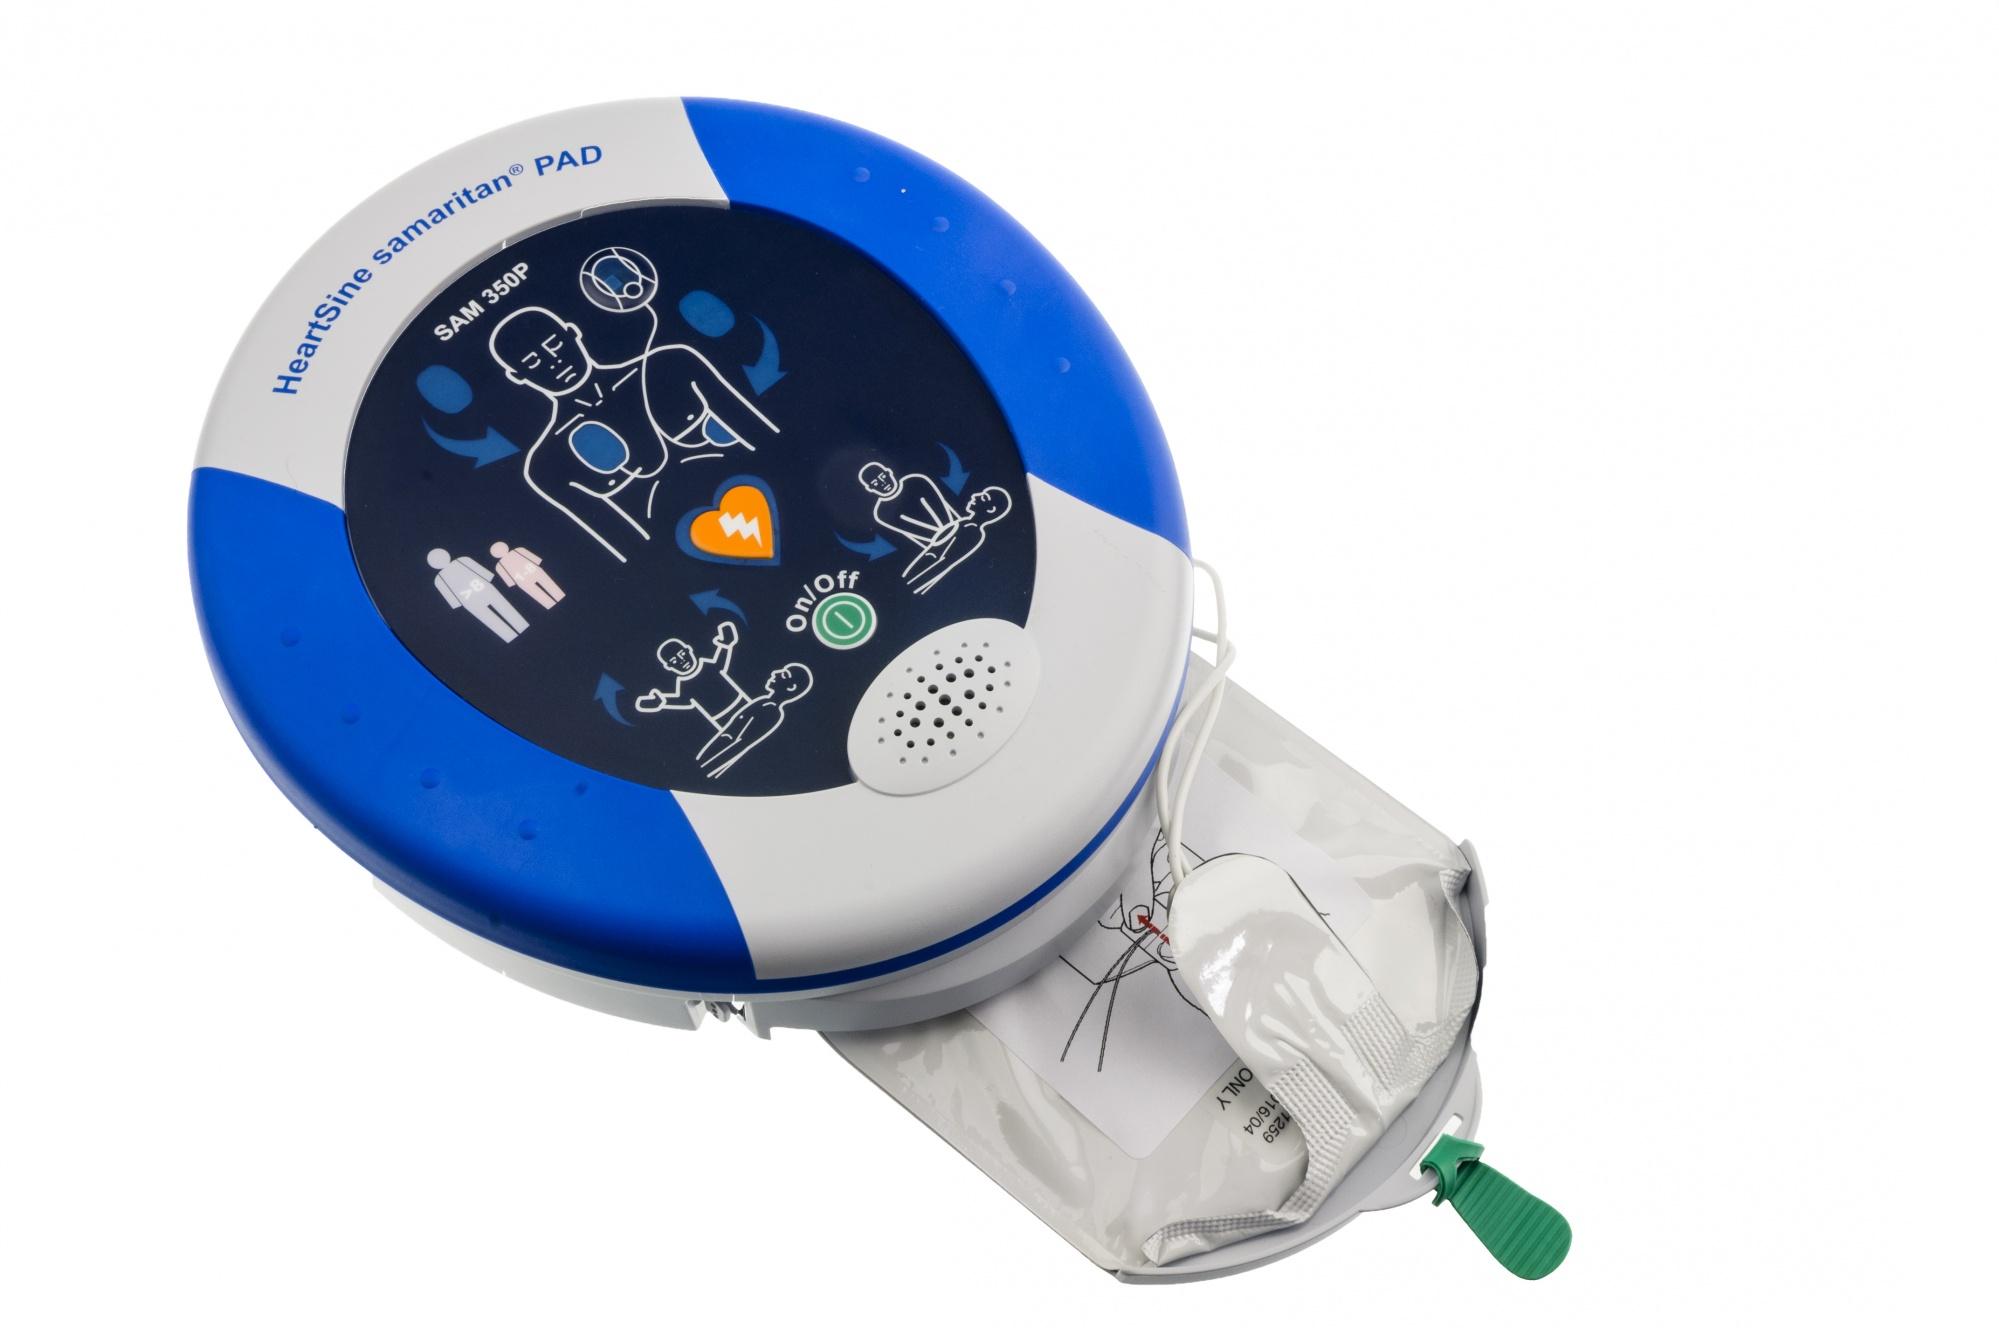 Defibrillatore-Semiautomatico-DAE-Heartsine-Samaritan-Pad-350P-extra-big-745-231